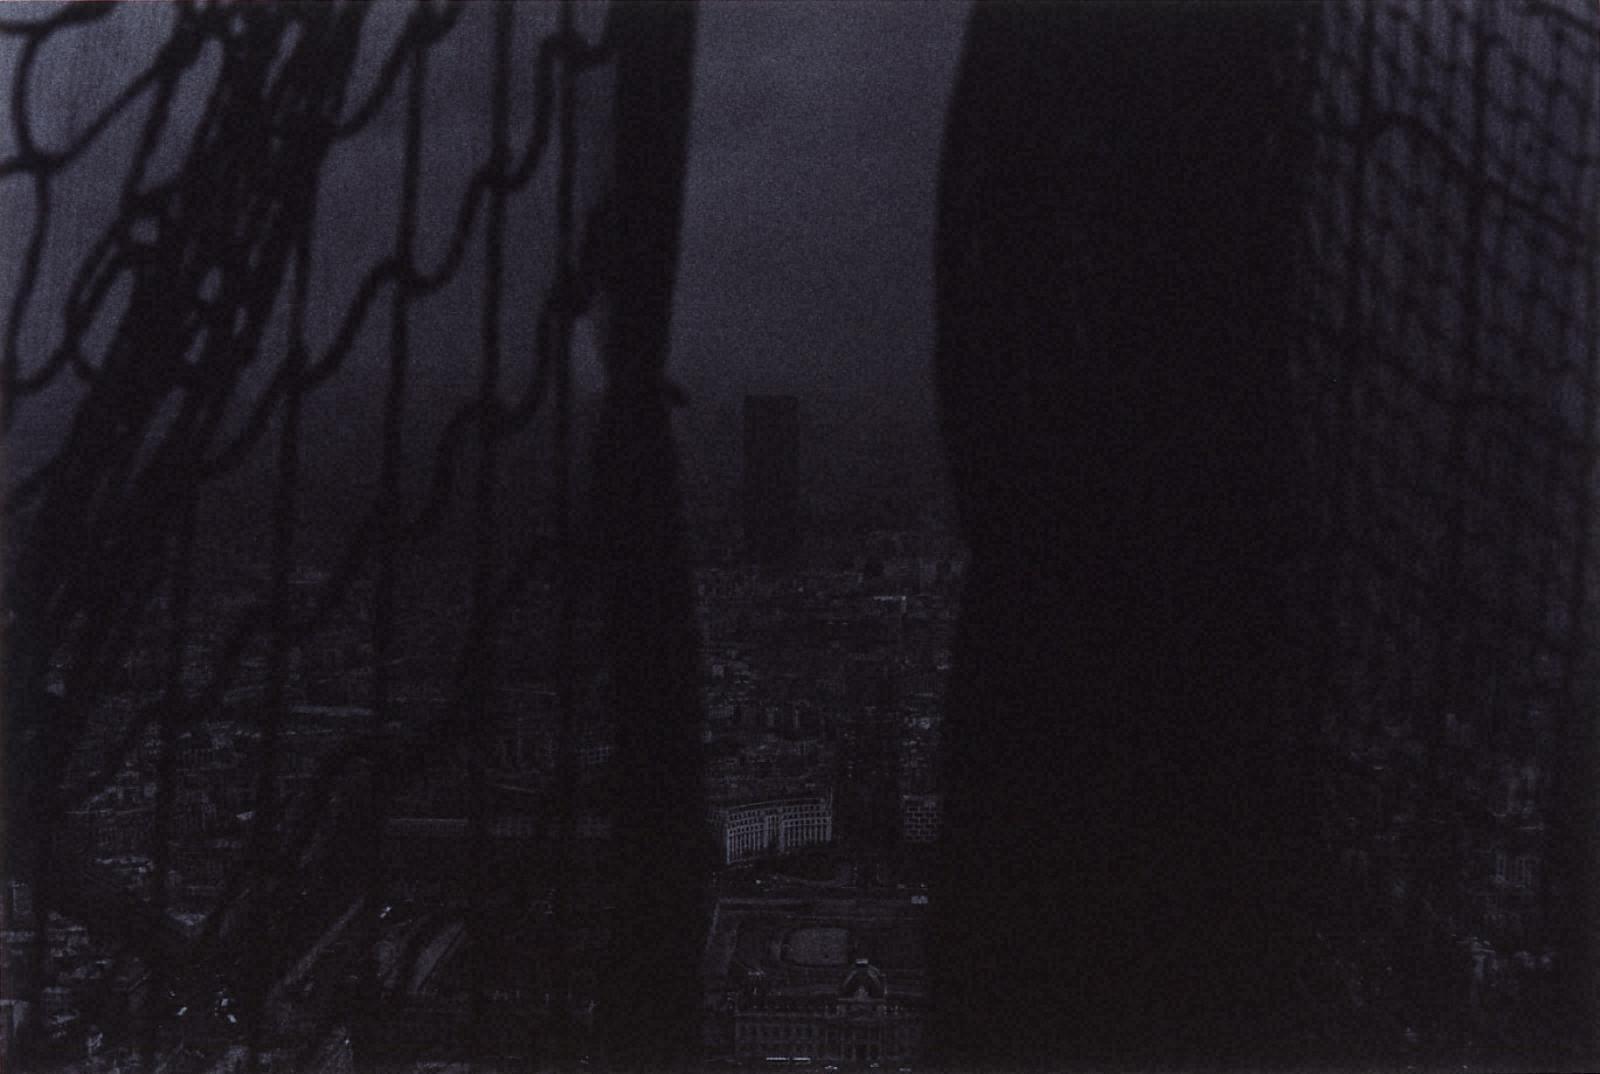 [Jun SHIRAOKA Photographs 1970-1998]フランス、パリ(エッフェル塔)、1993年4月1日